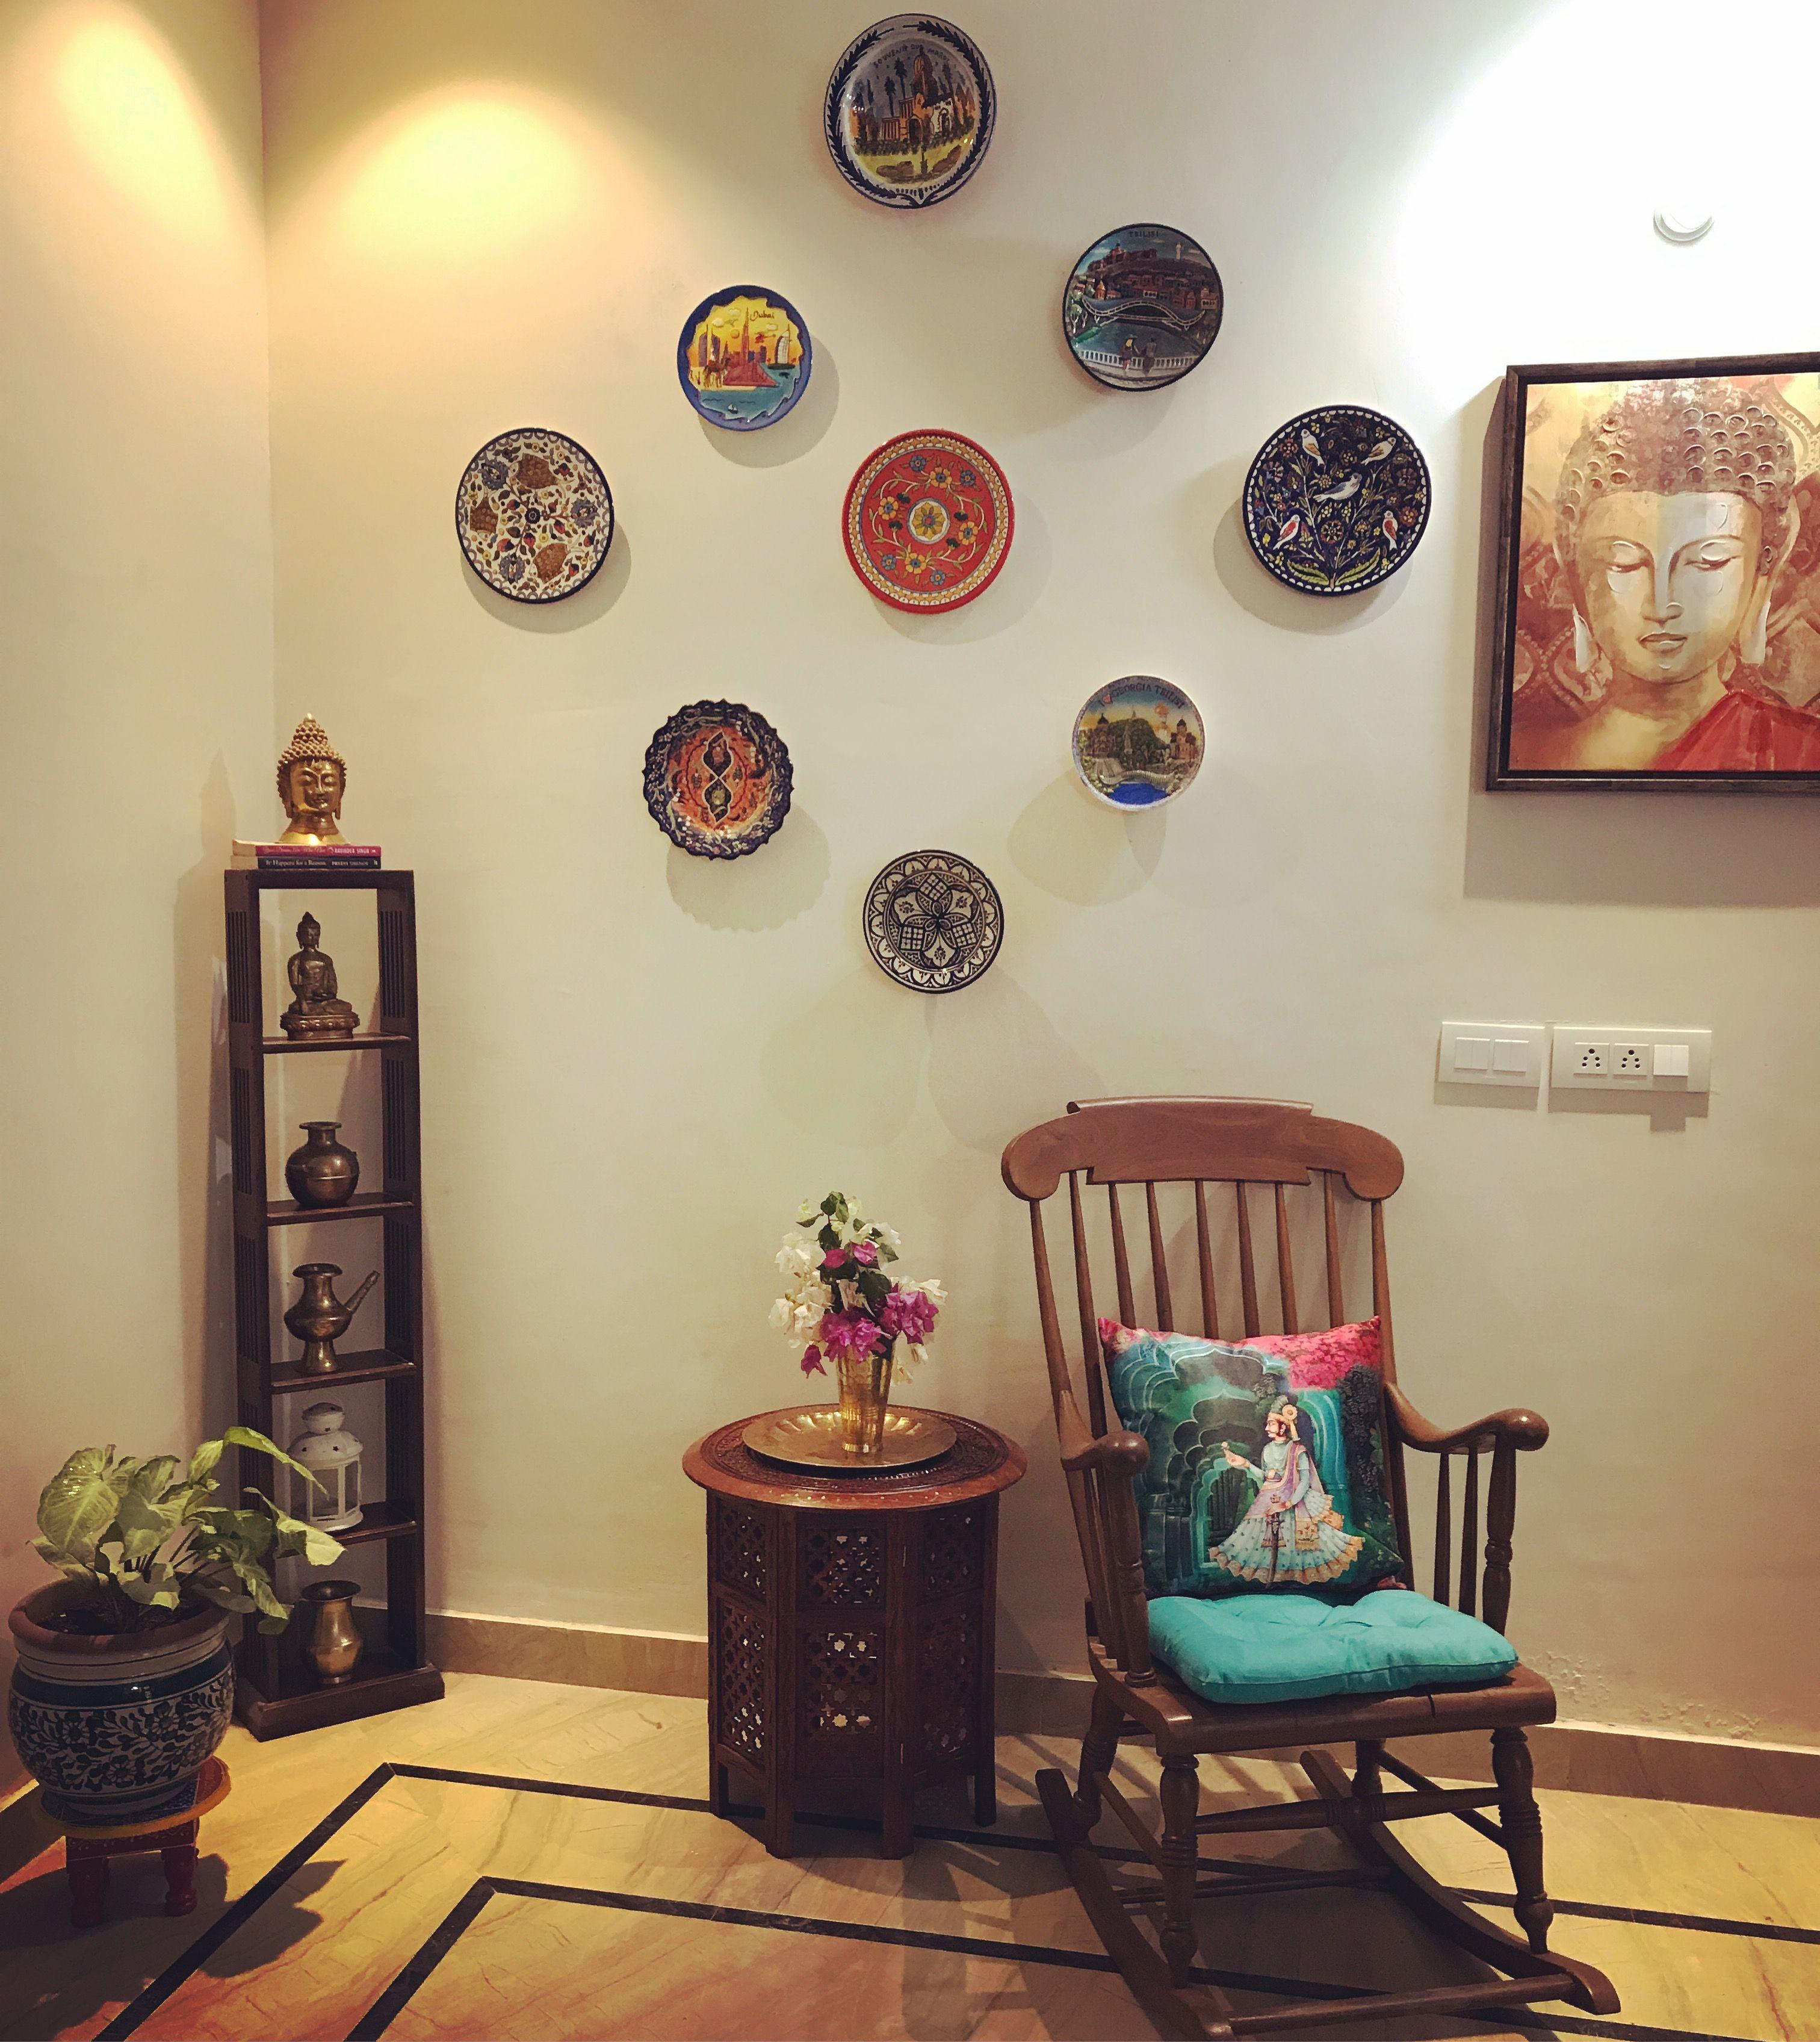 Plate wall #wallplate #plates #imdianhomedecor #walldecor